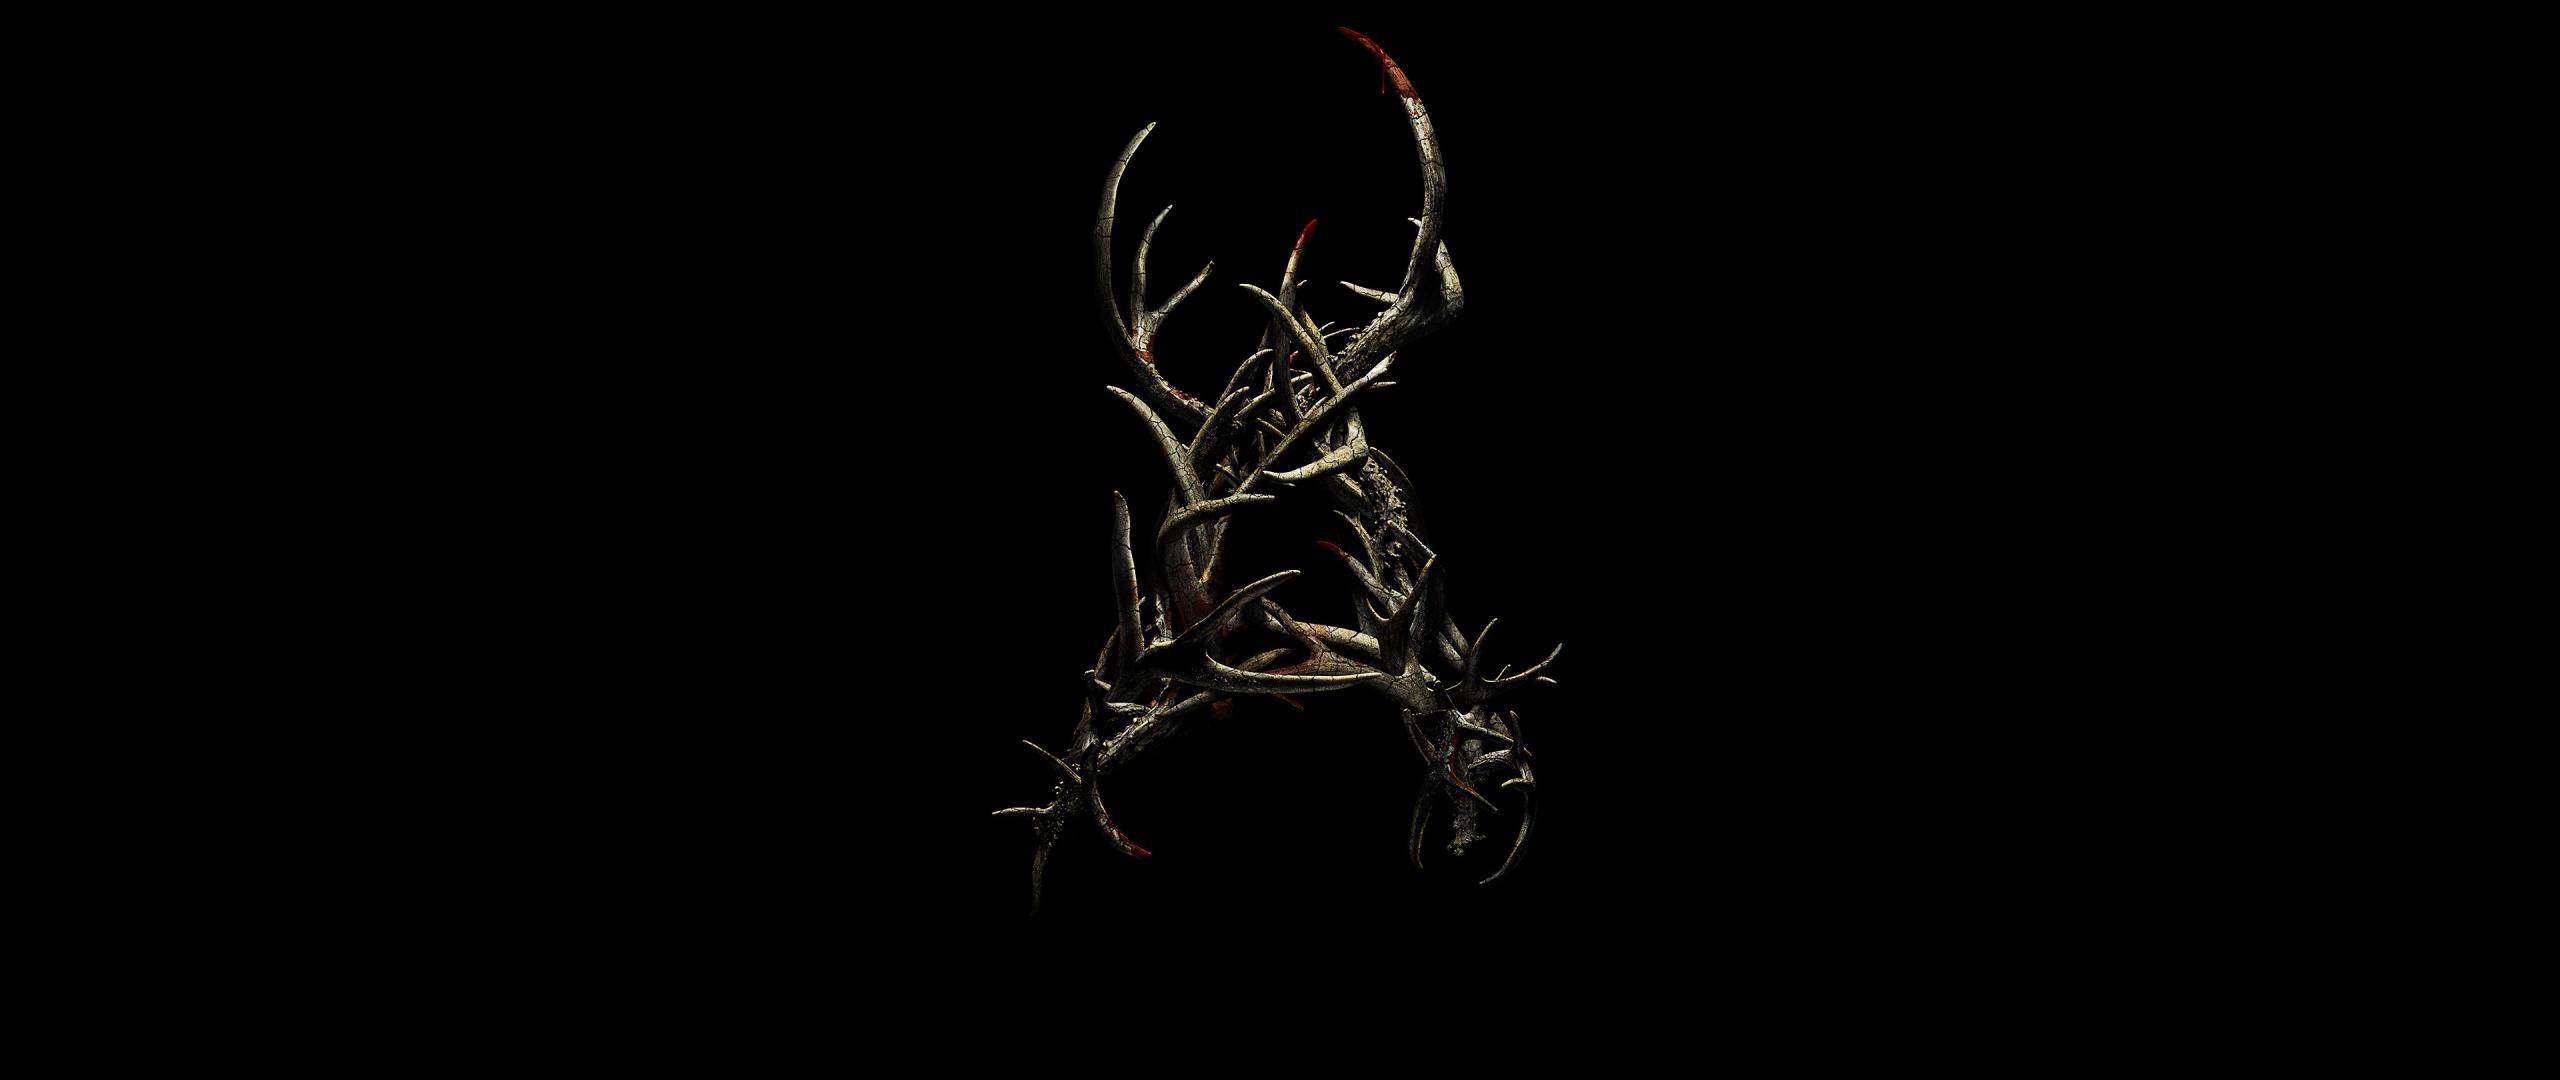 Antlers Movie Wallpaper in 2560x1080 Resolution